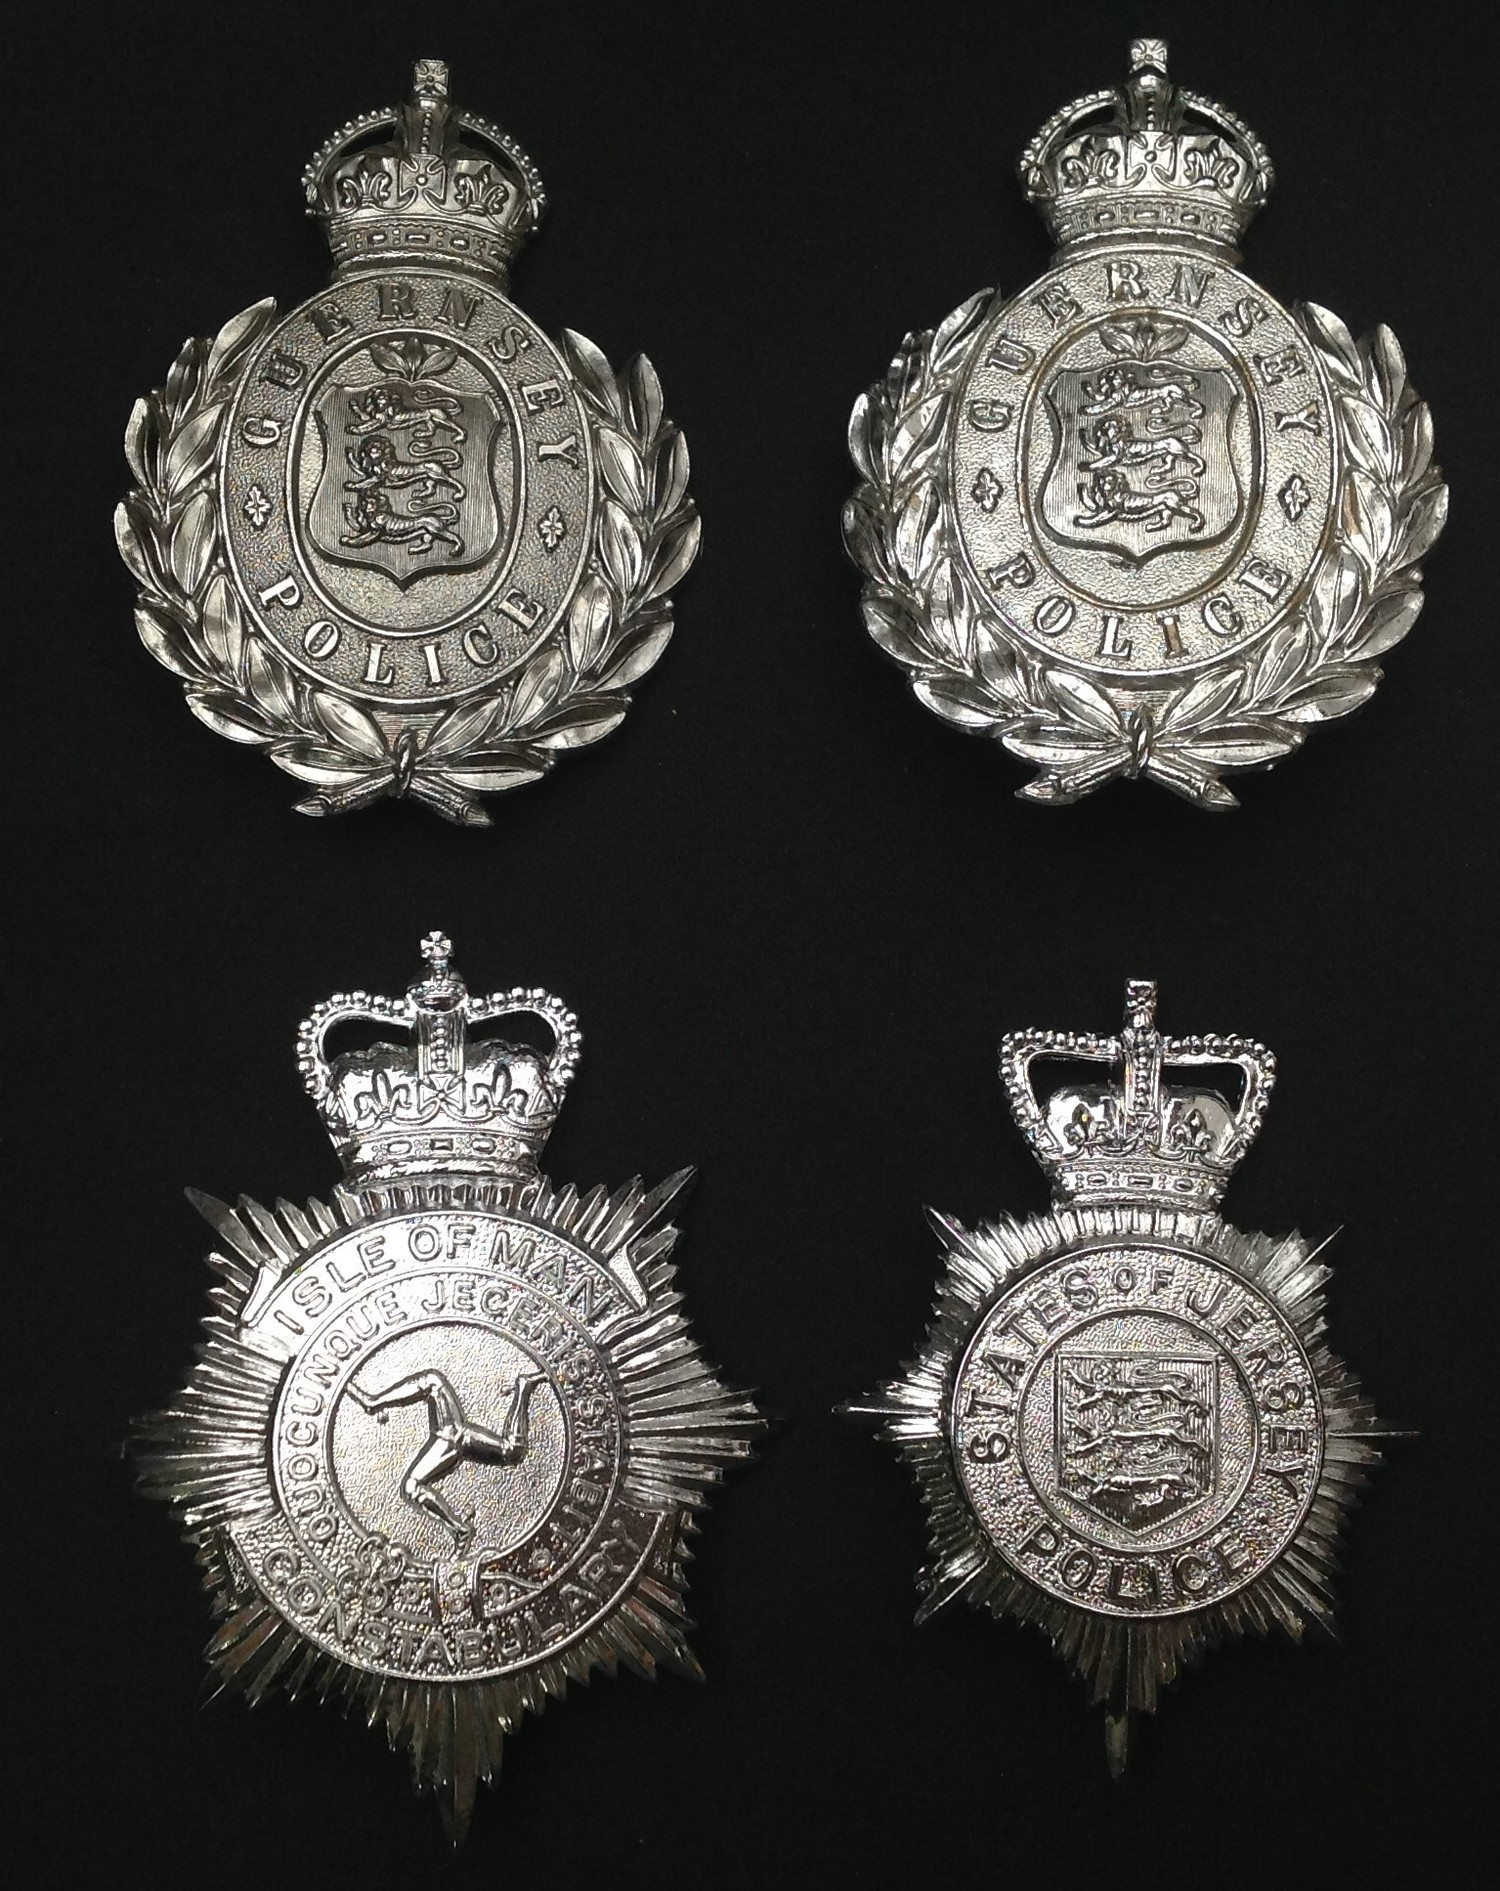 Kings Crown Guernsey Police Helmet Plates x 2: Queens Crown States of Jersey Helmet Plate: Queens